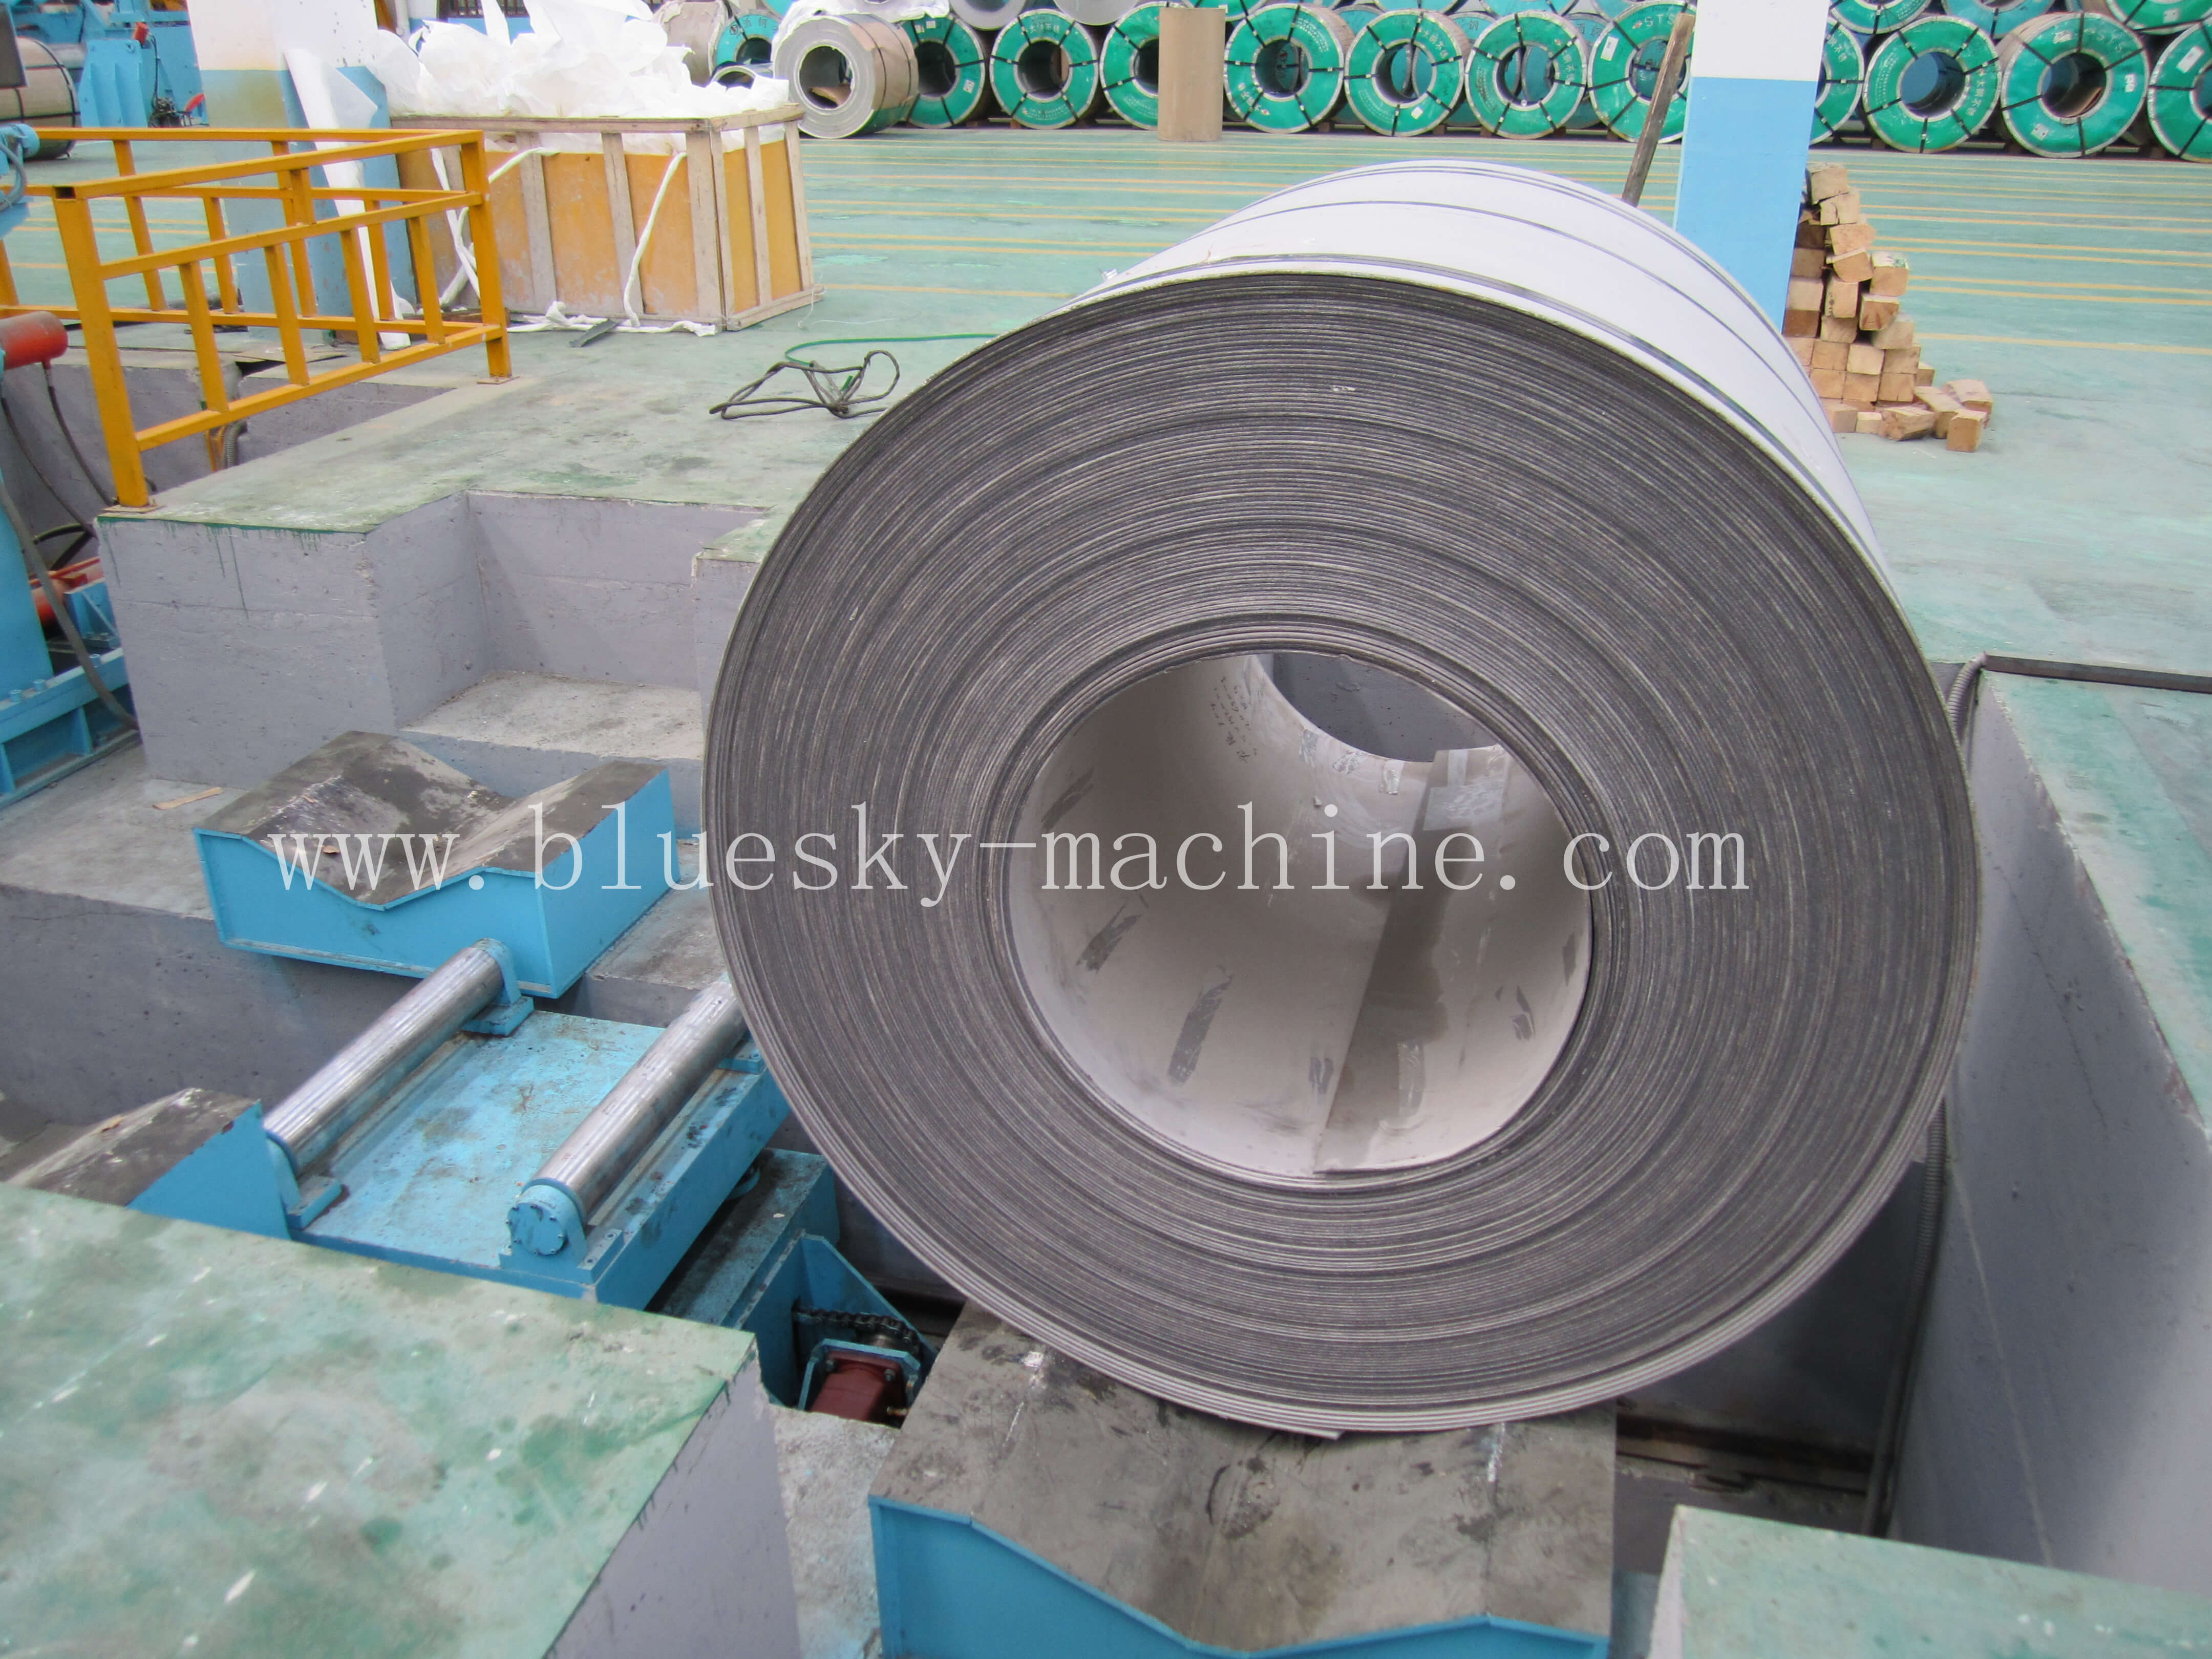 slitting machine manufacturer in ahmedabad